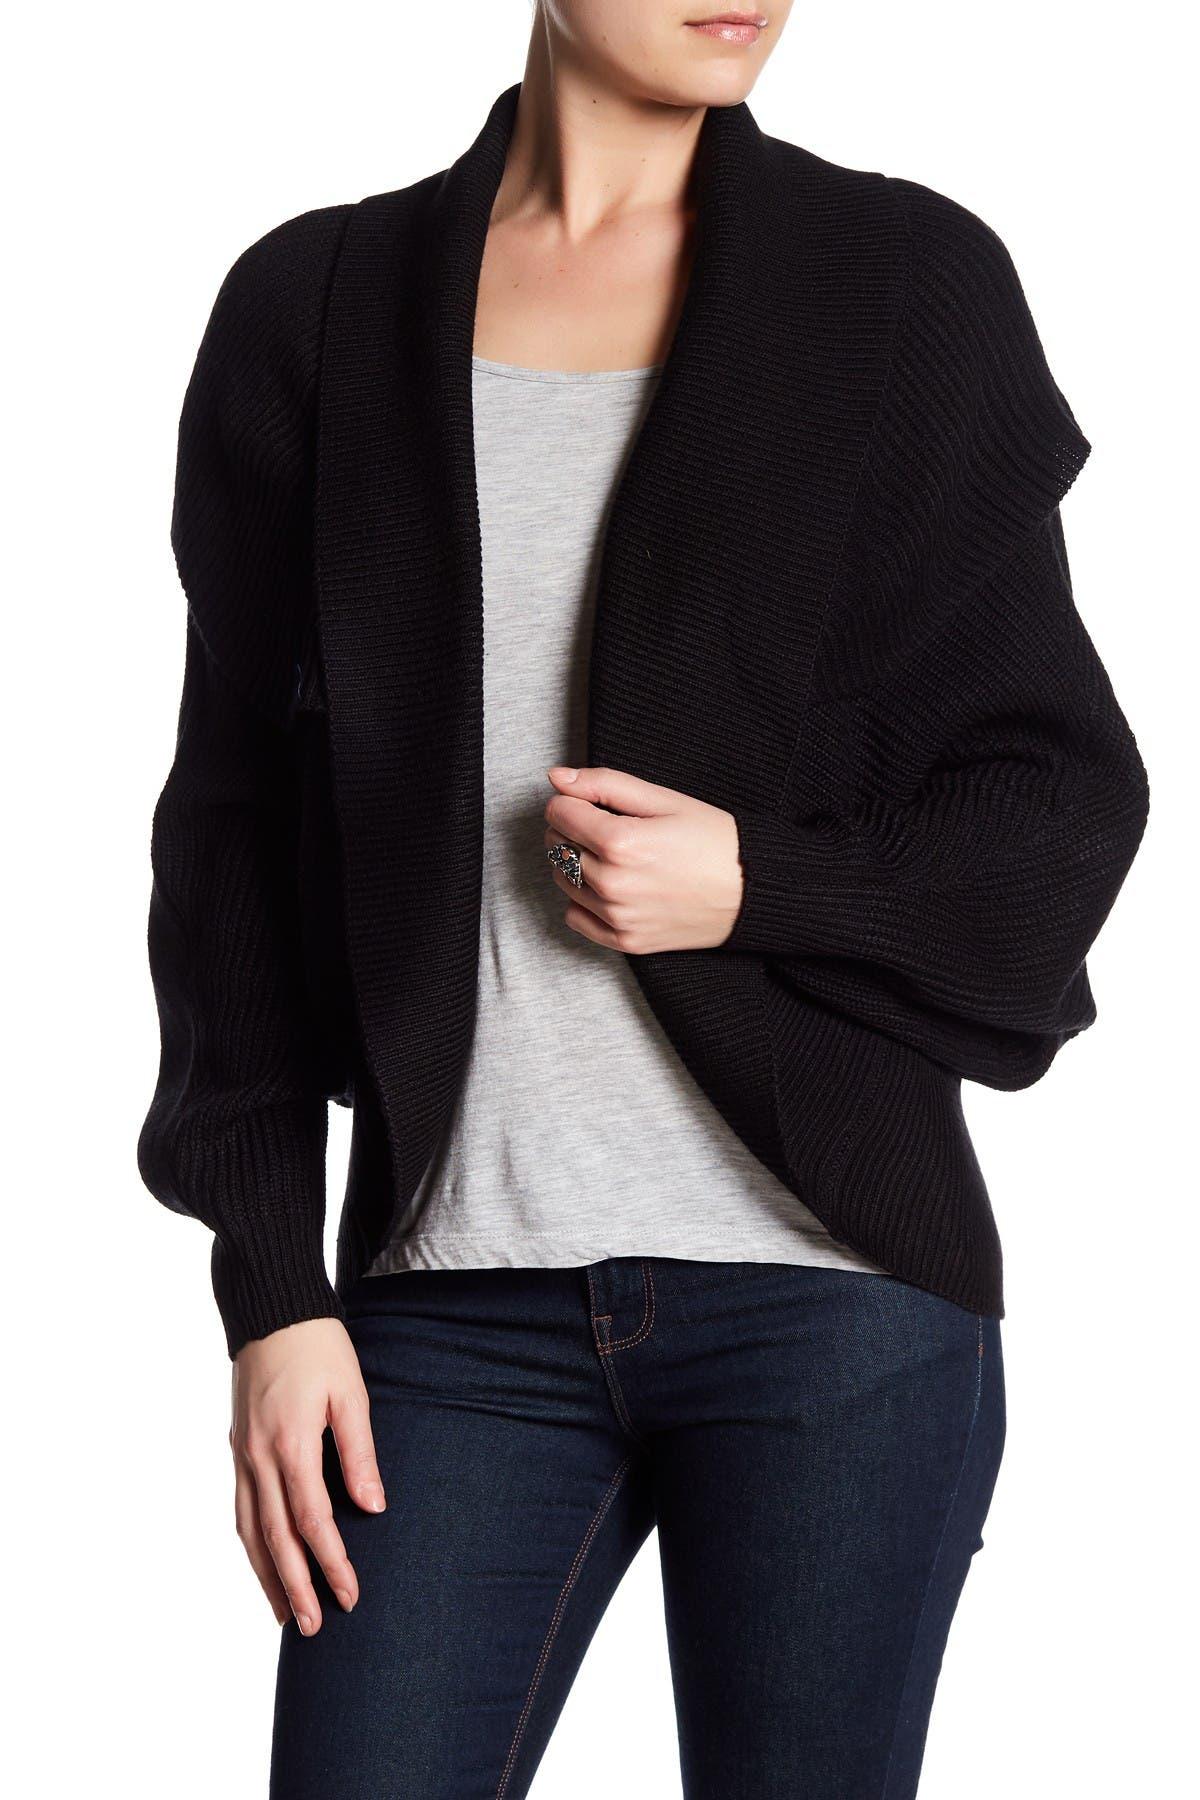 Image of Vertigo Rib Knit Cocoon Sweater